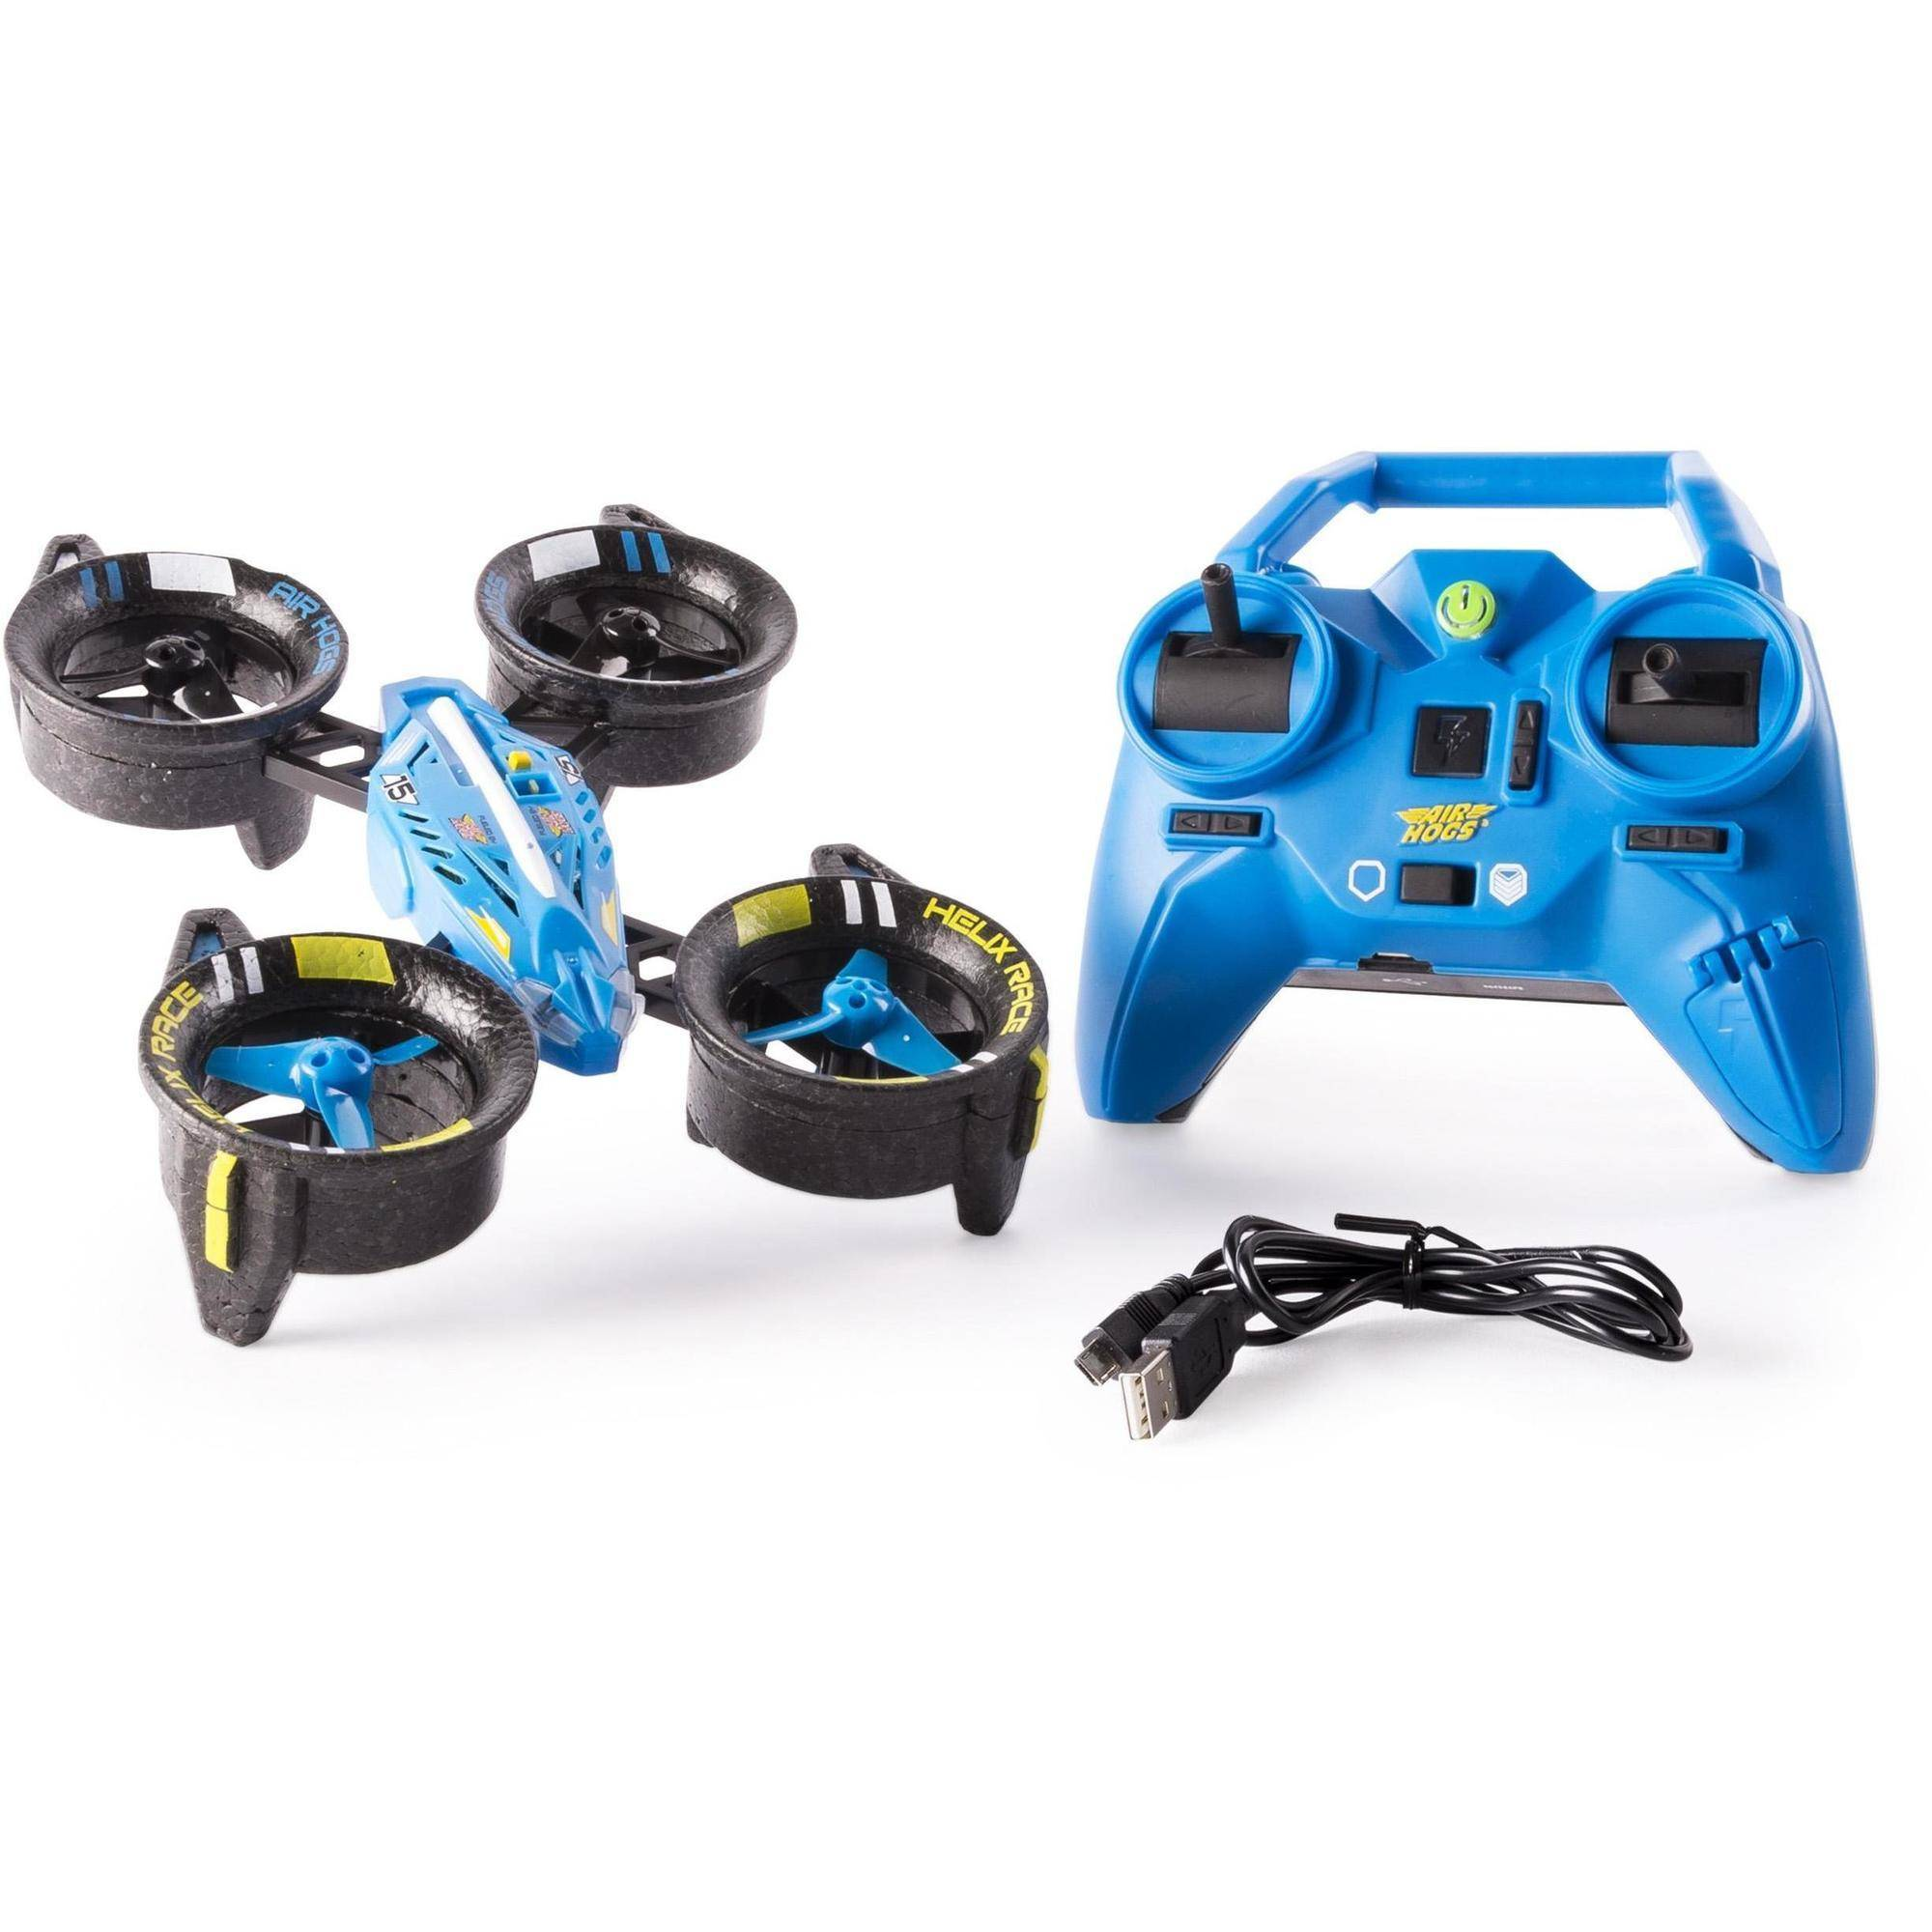 Air Hogs, Helix Race Drone, 2.4 GHZ, Blue RC Vehicle